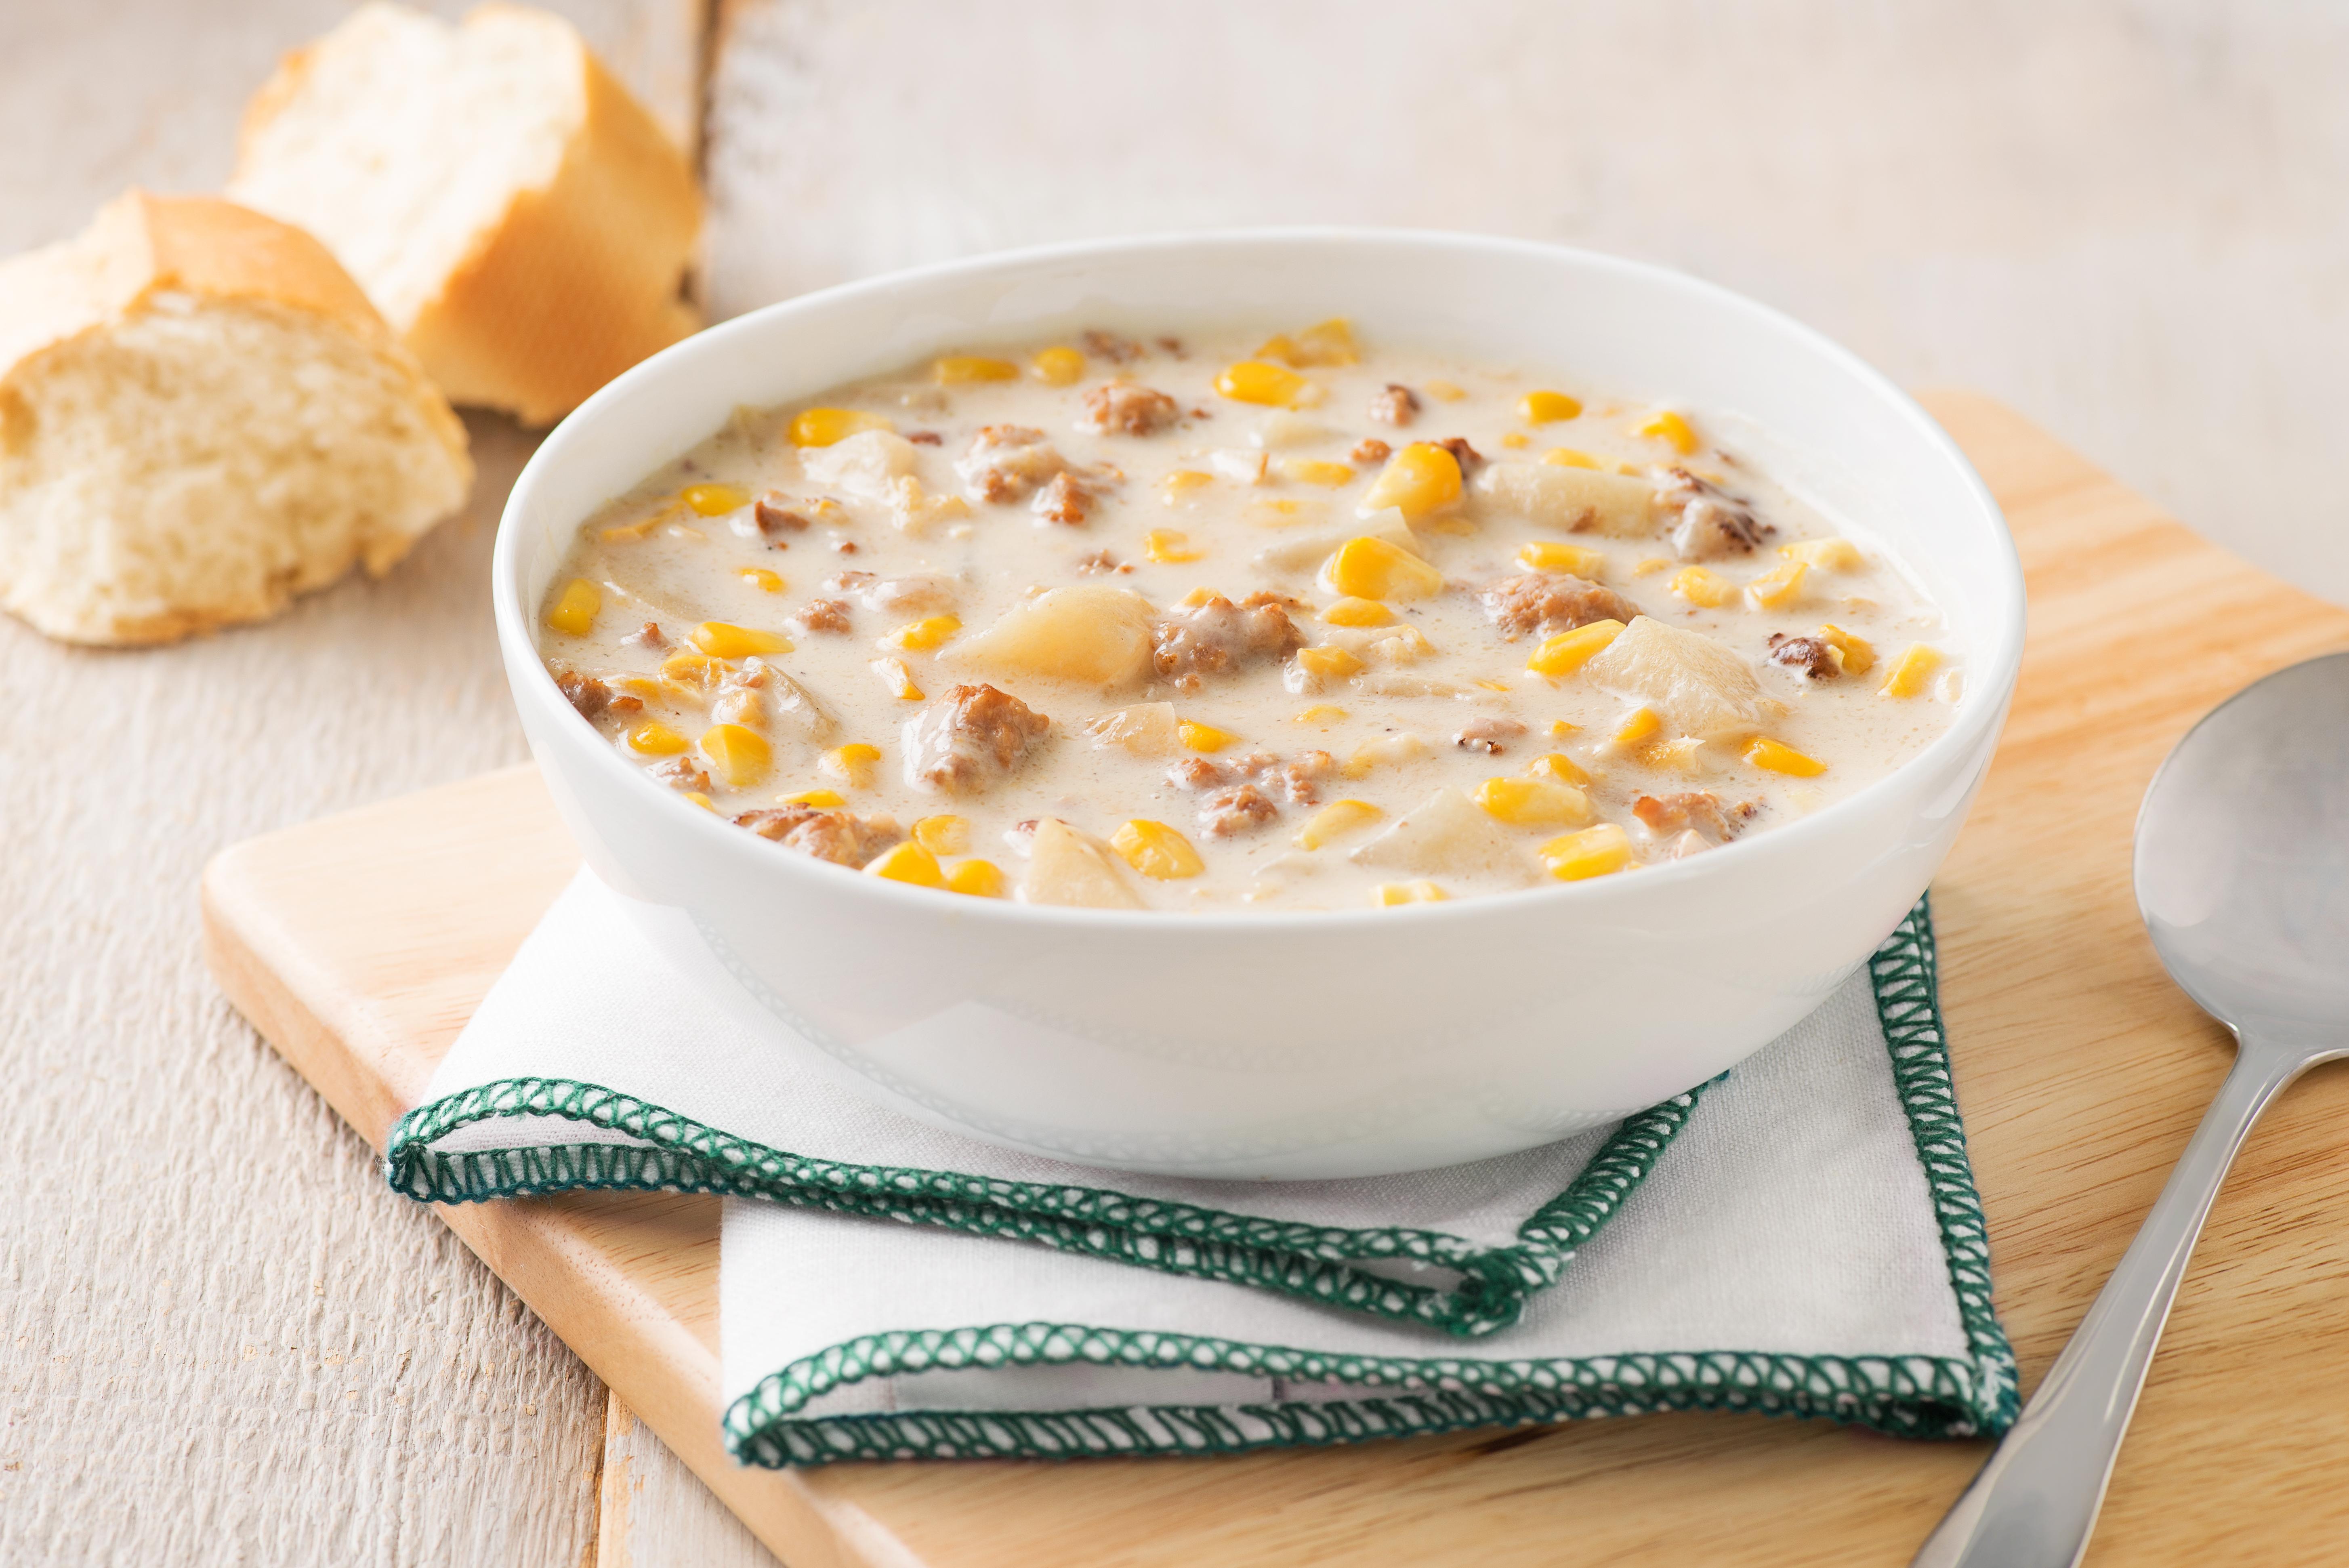 Corn, Potato and Sausage Chowder